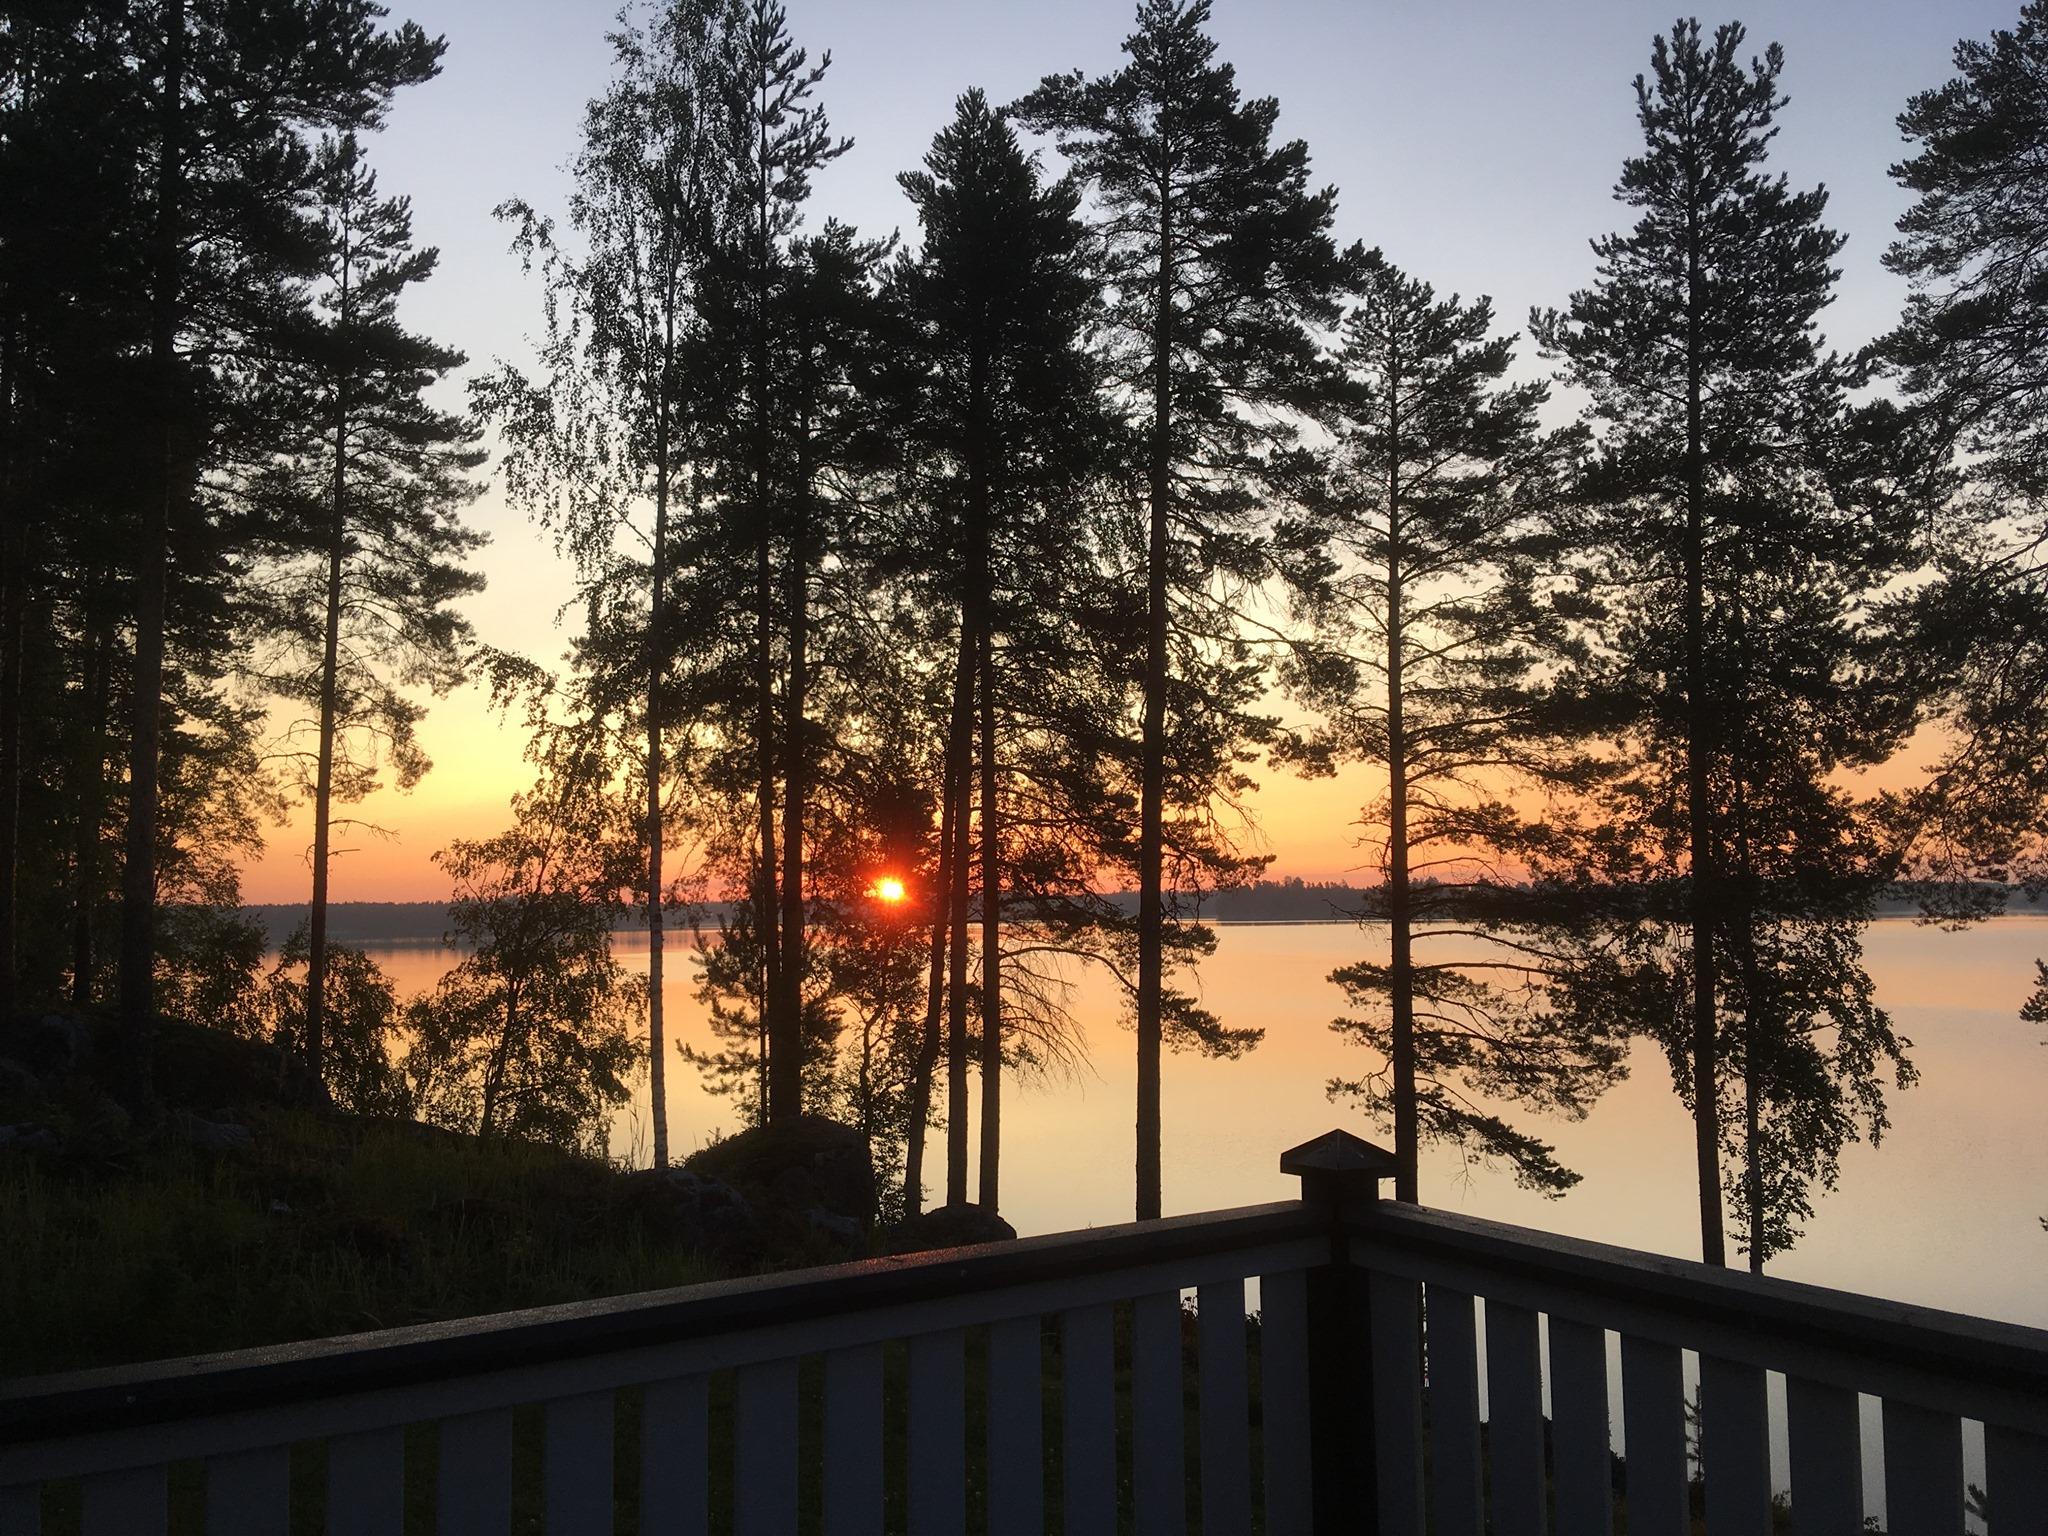 Sonnenaufgang in Pieksämäki